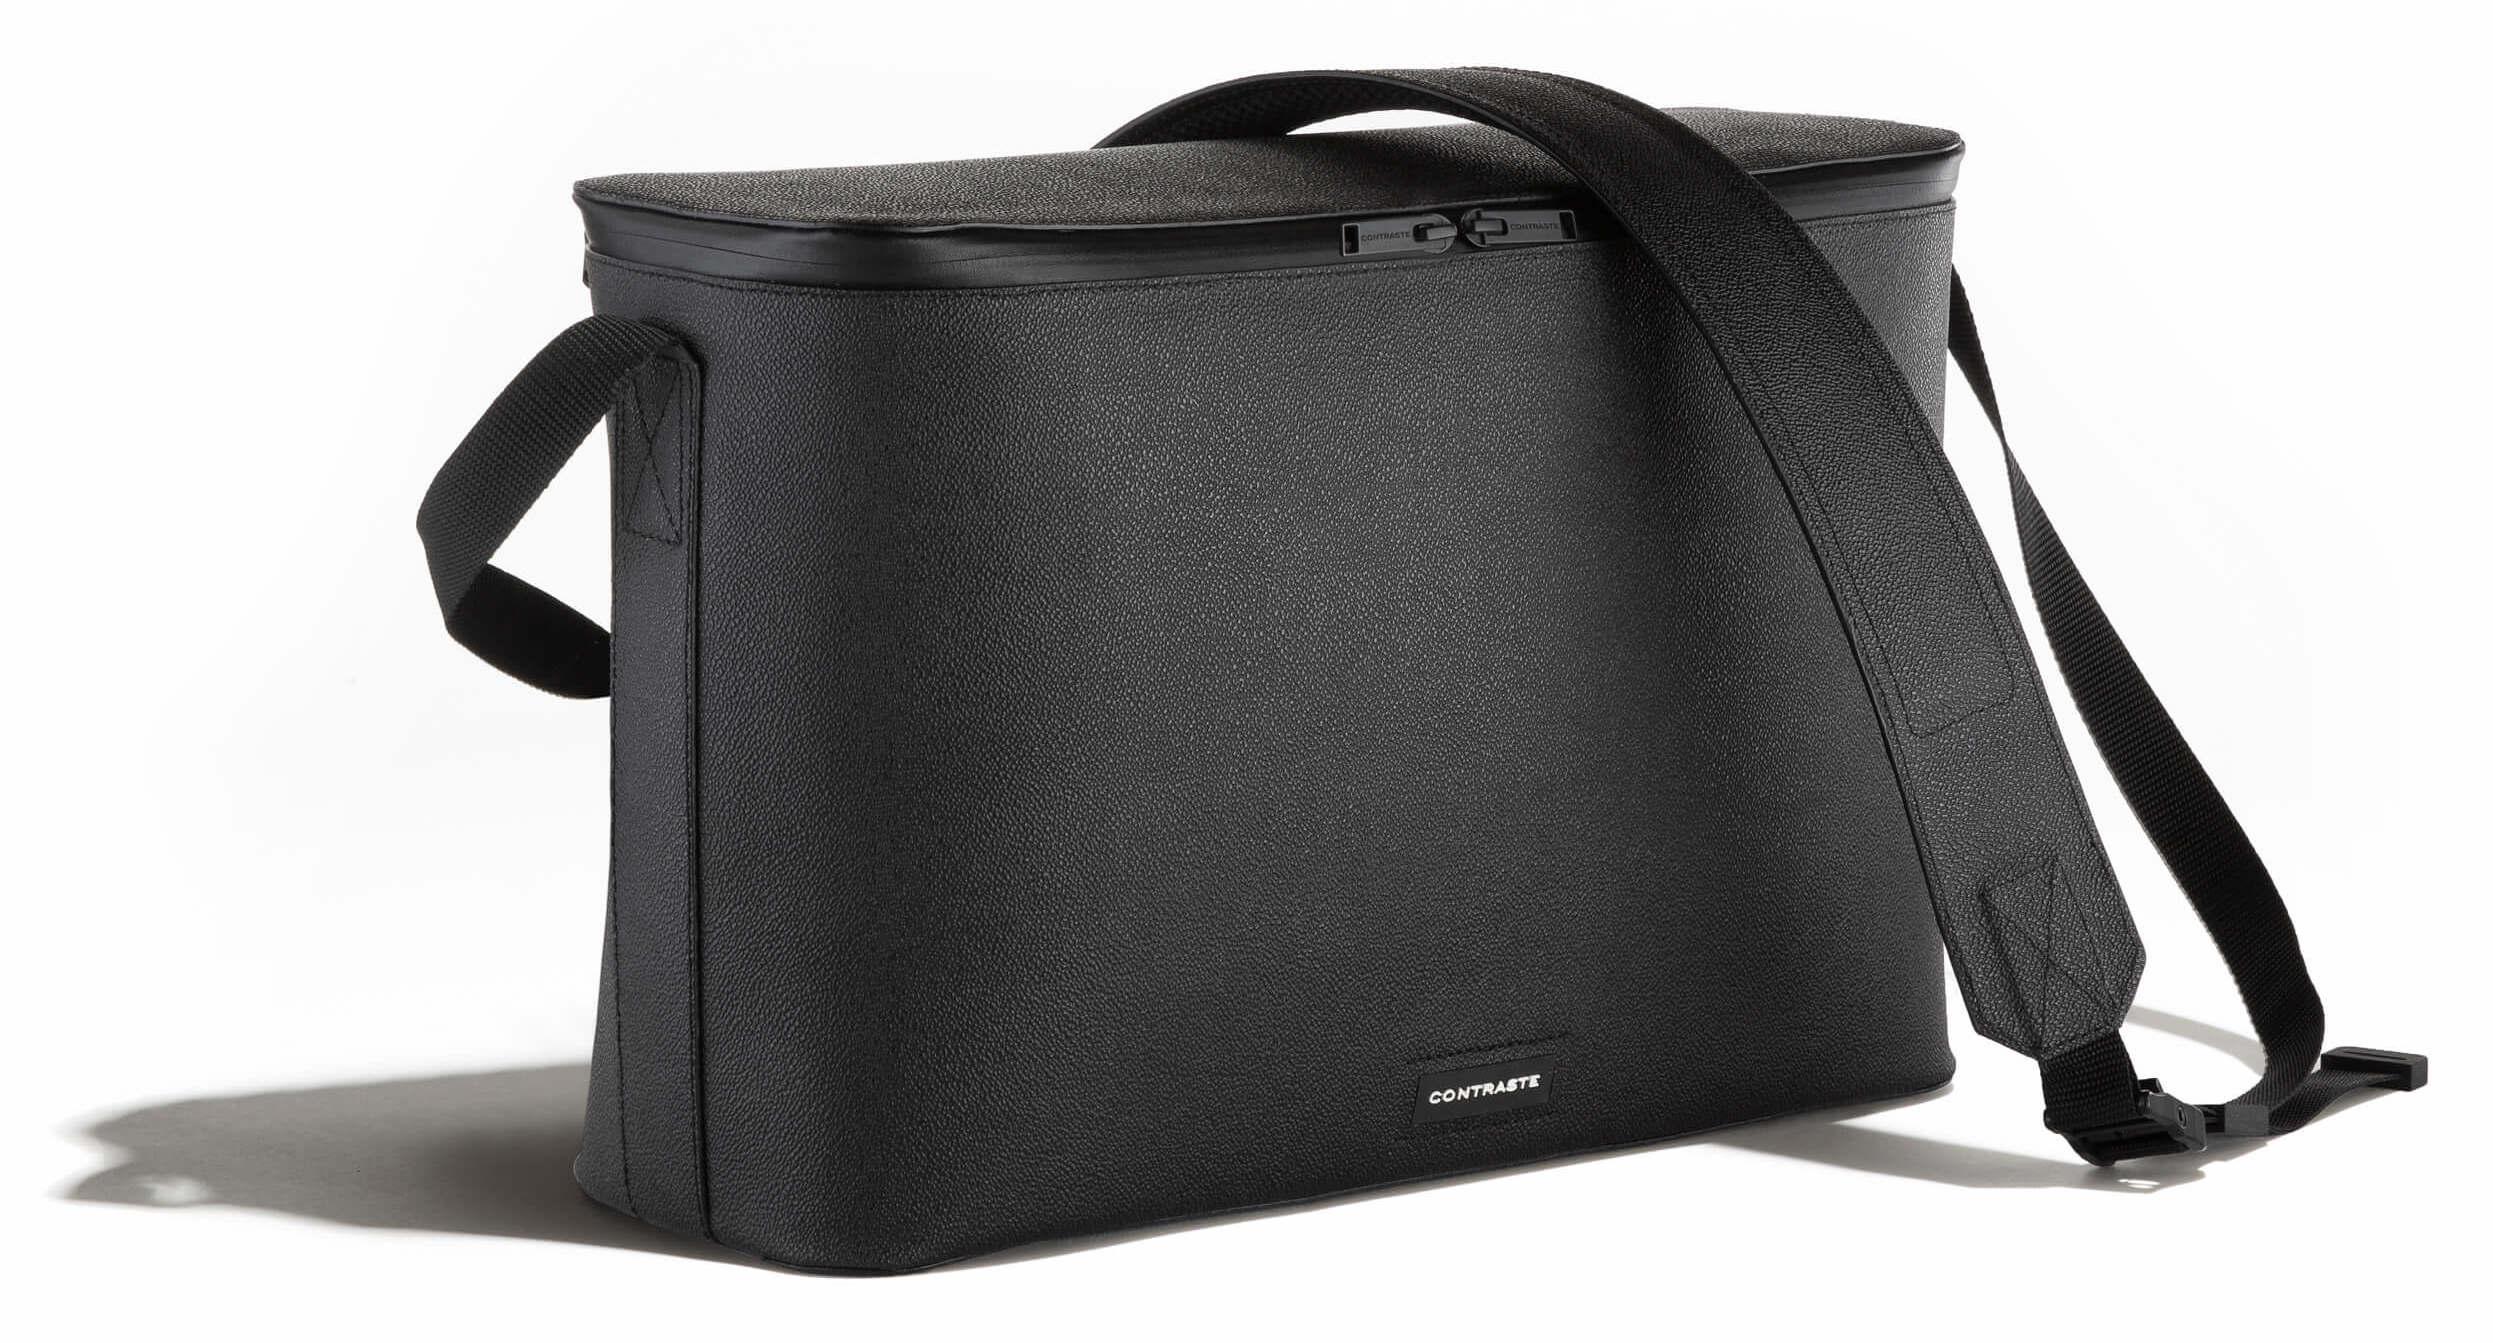 camera bag best purse women black leather small travel designer shoulder waterproof photographer hiking laptop leica contraste paris  messenger